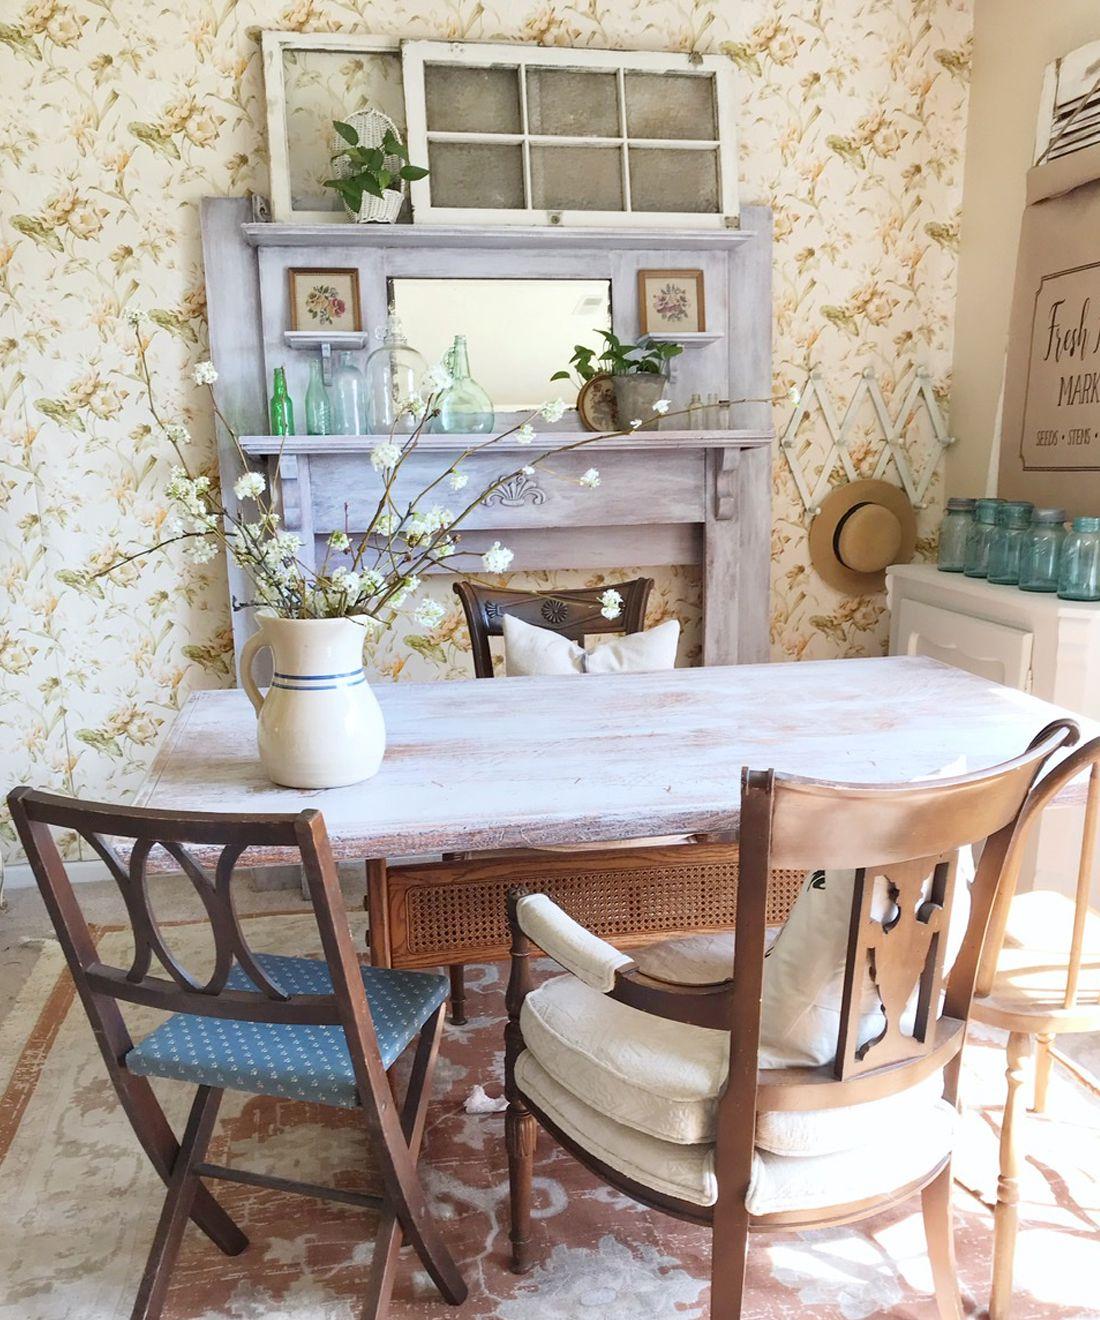 Aux Fleurs • Vintage Wallpaper • Dining Room Wallpaper • Kitchen Wallpaper • @homechronicles •Adele Brown